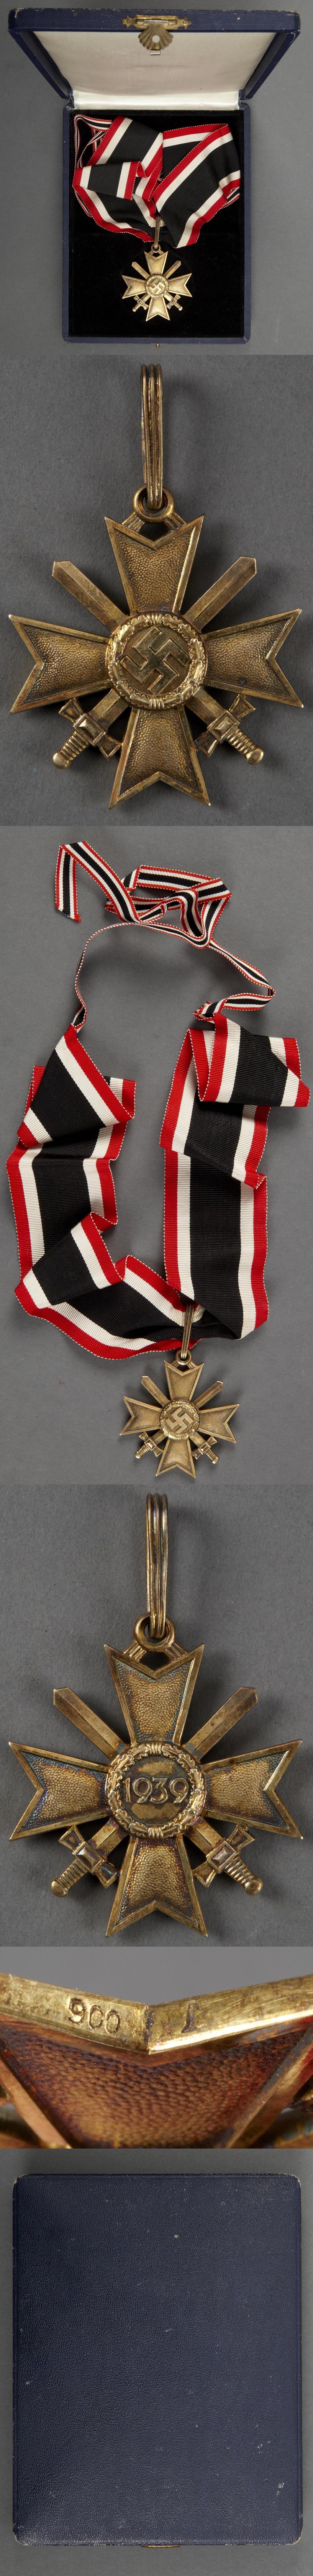 Cased Golden Knights Cross of the War Merit Cross